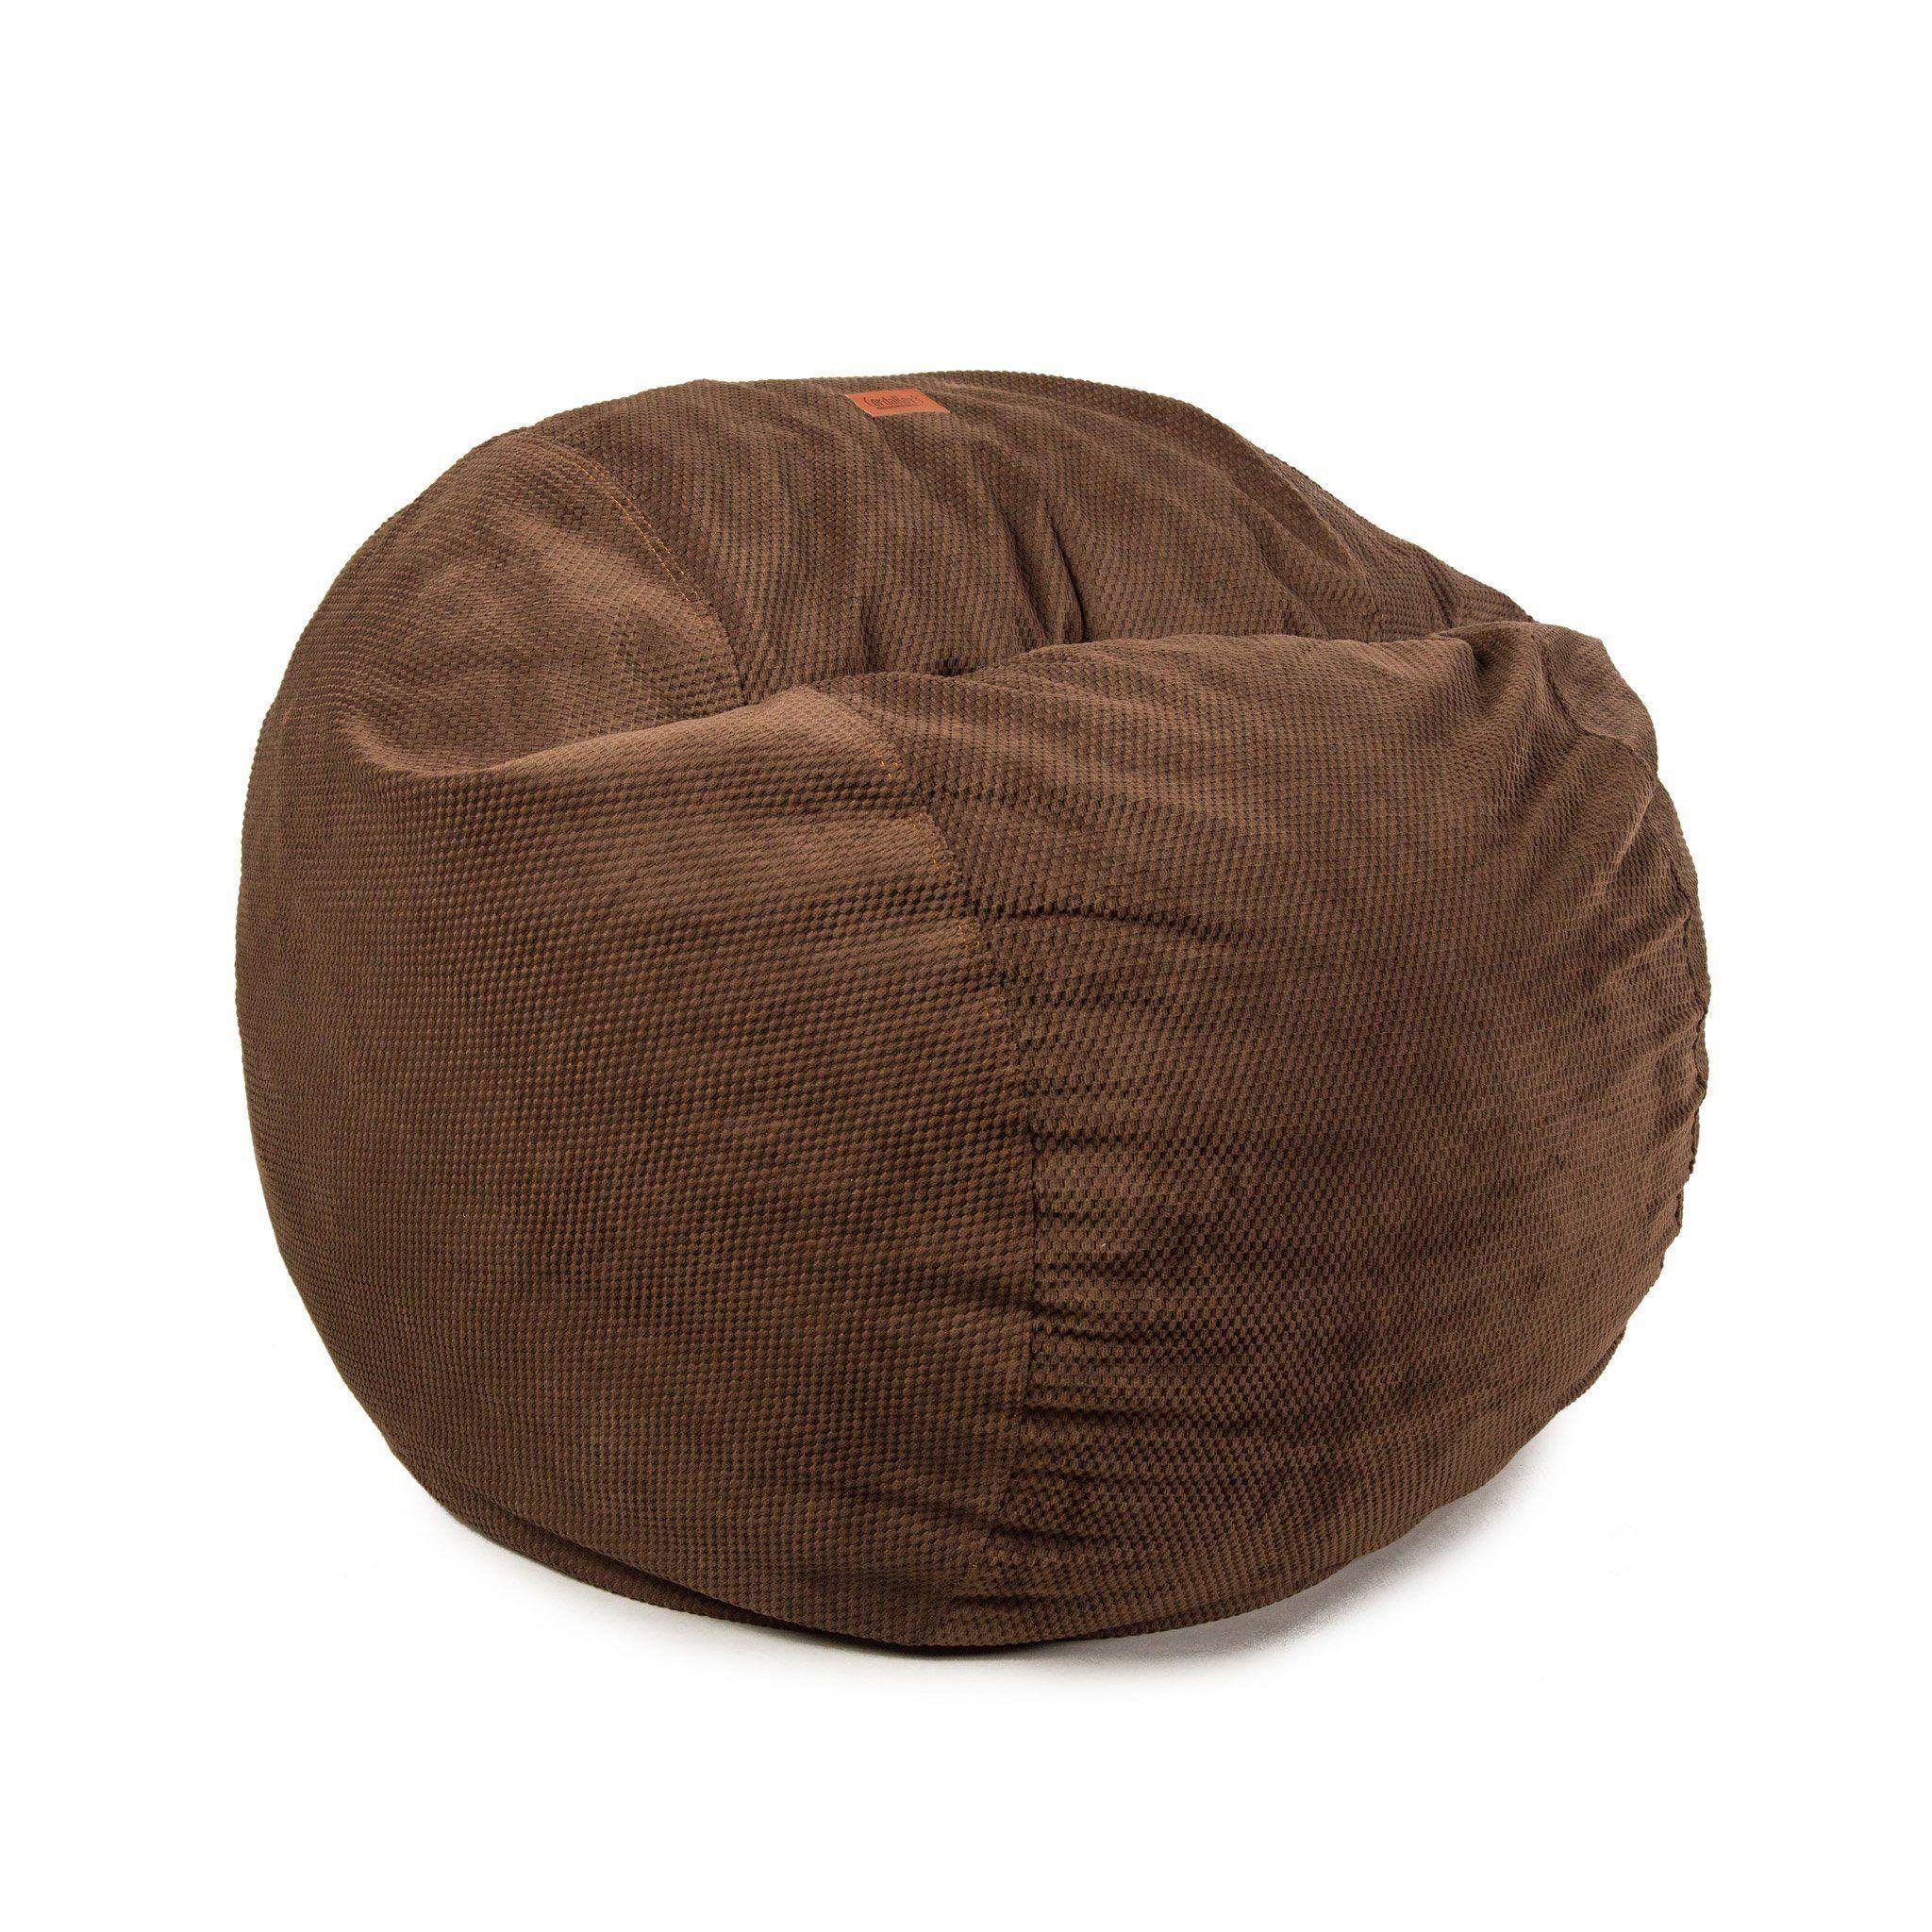 Marvelous Full Chair Chenille In 2019 Furniture Bean Bag Bed Creativecarmelina Interior Chair Design Creativecarmelinacom